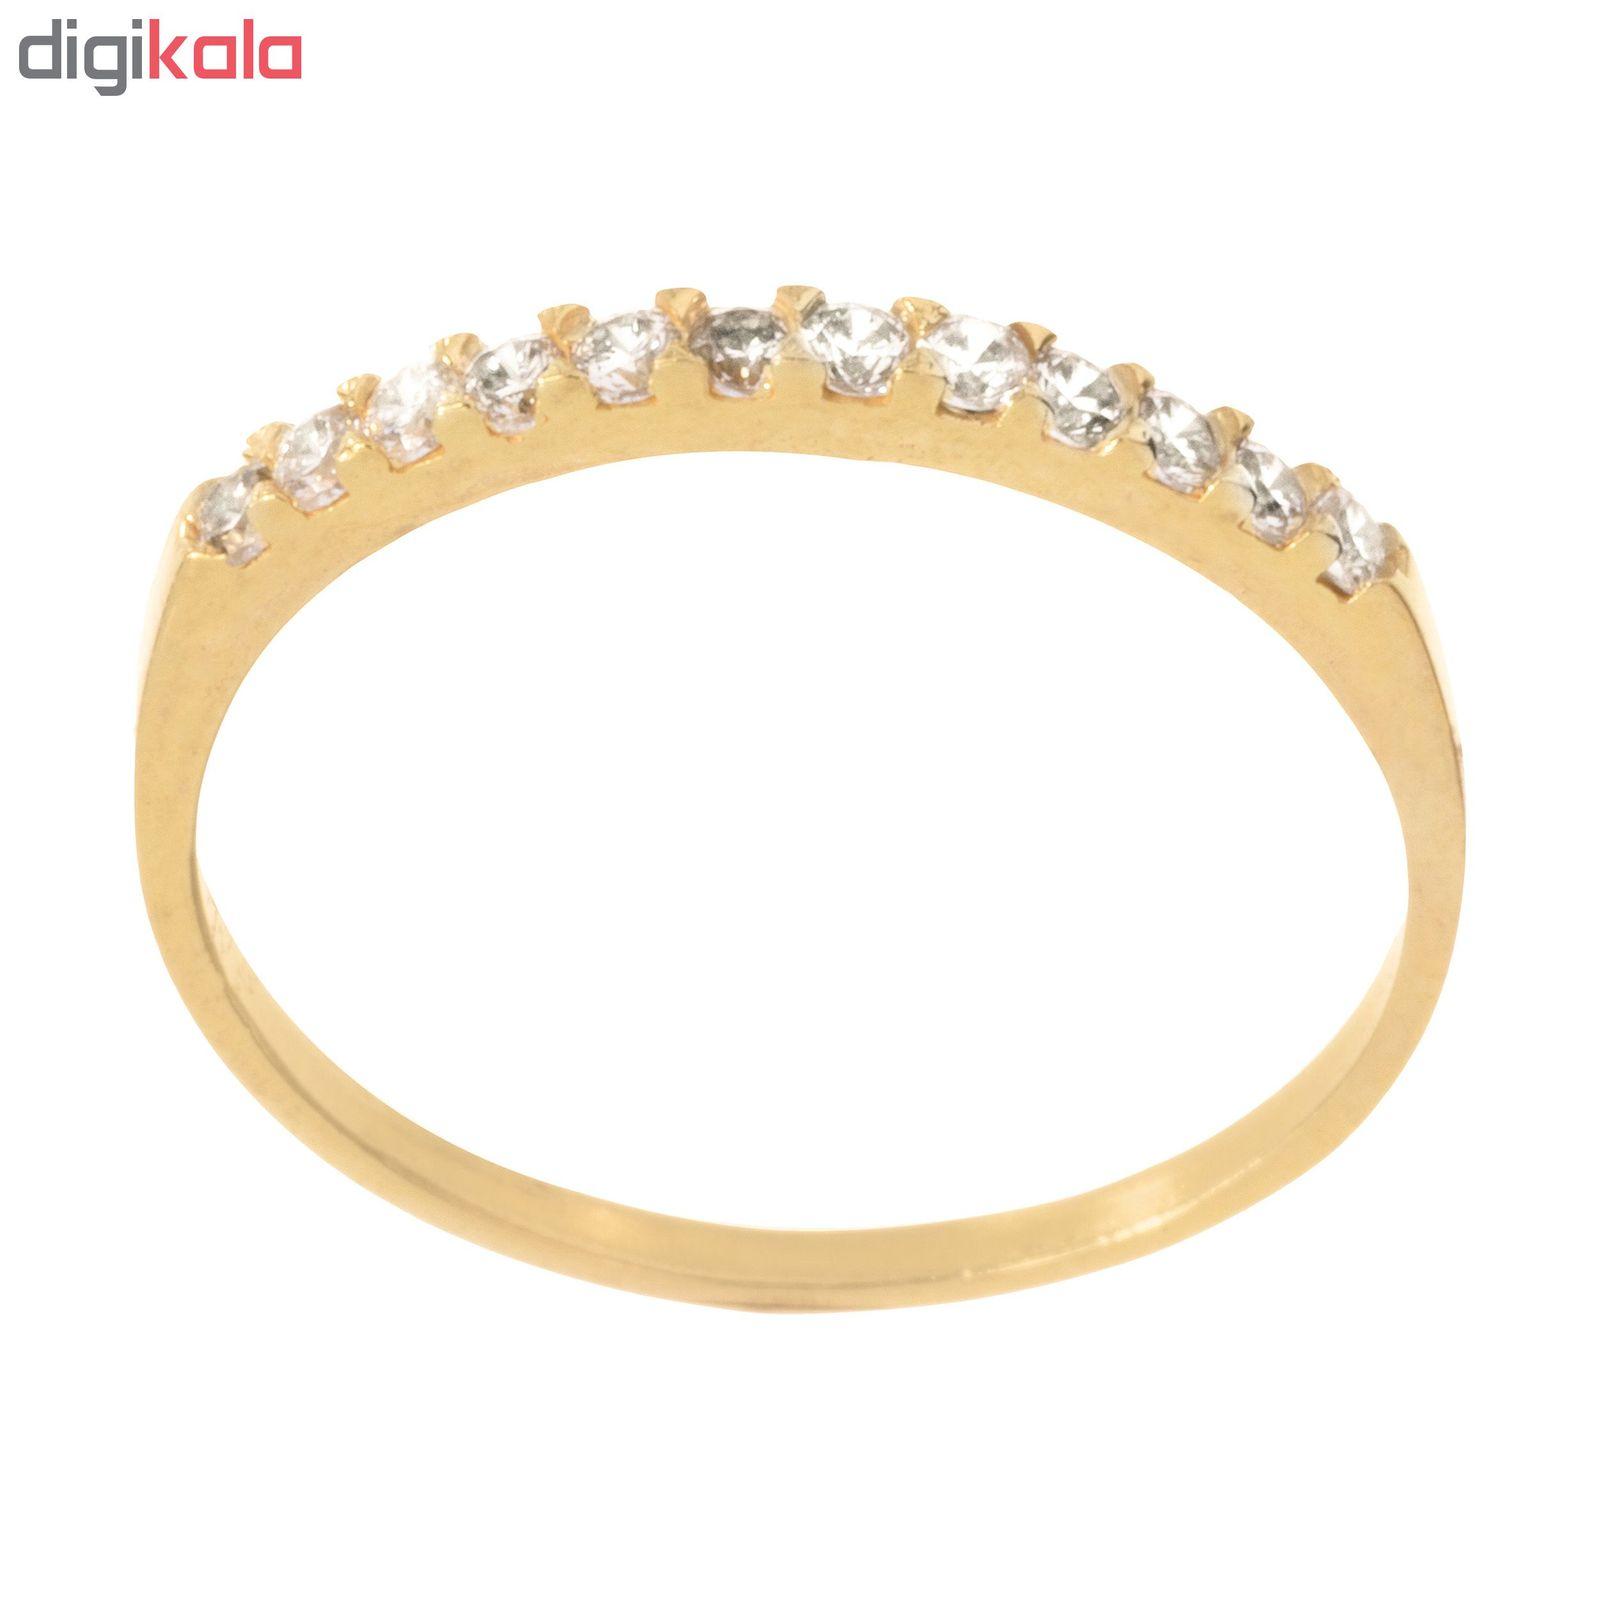 انگشتر طلا 18 عیار زنانه کد G906 thumb 2 1